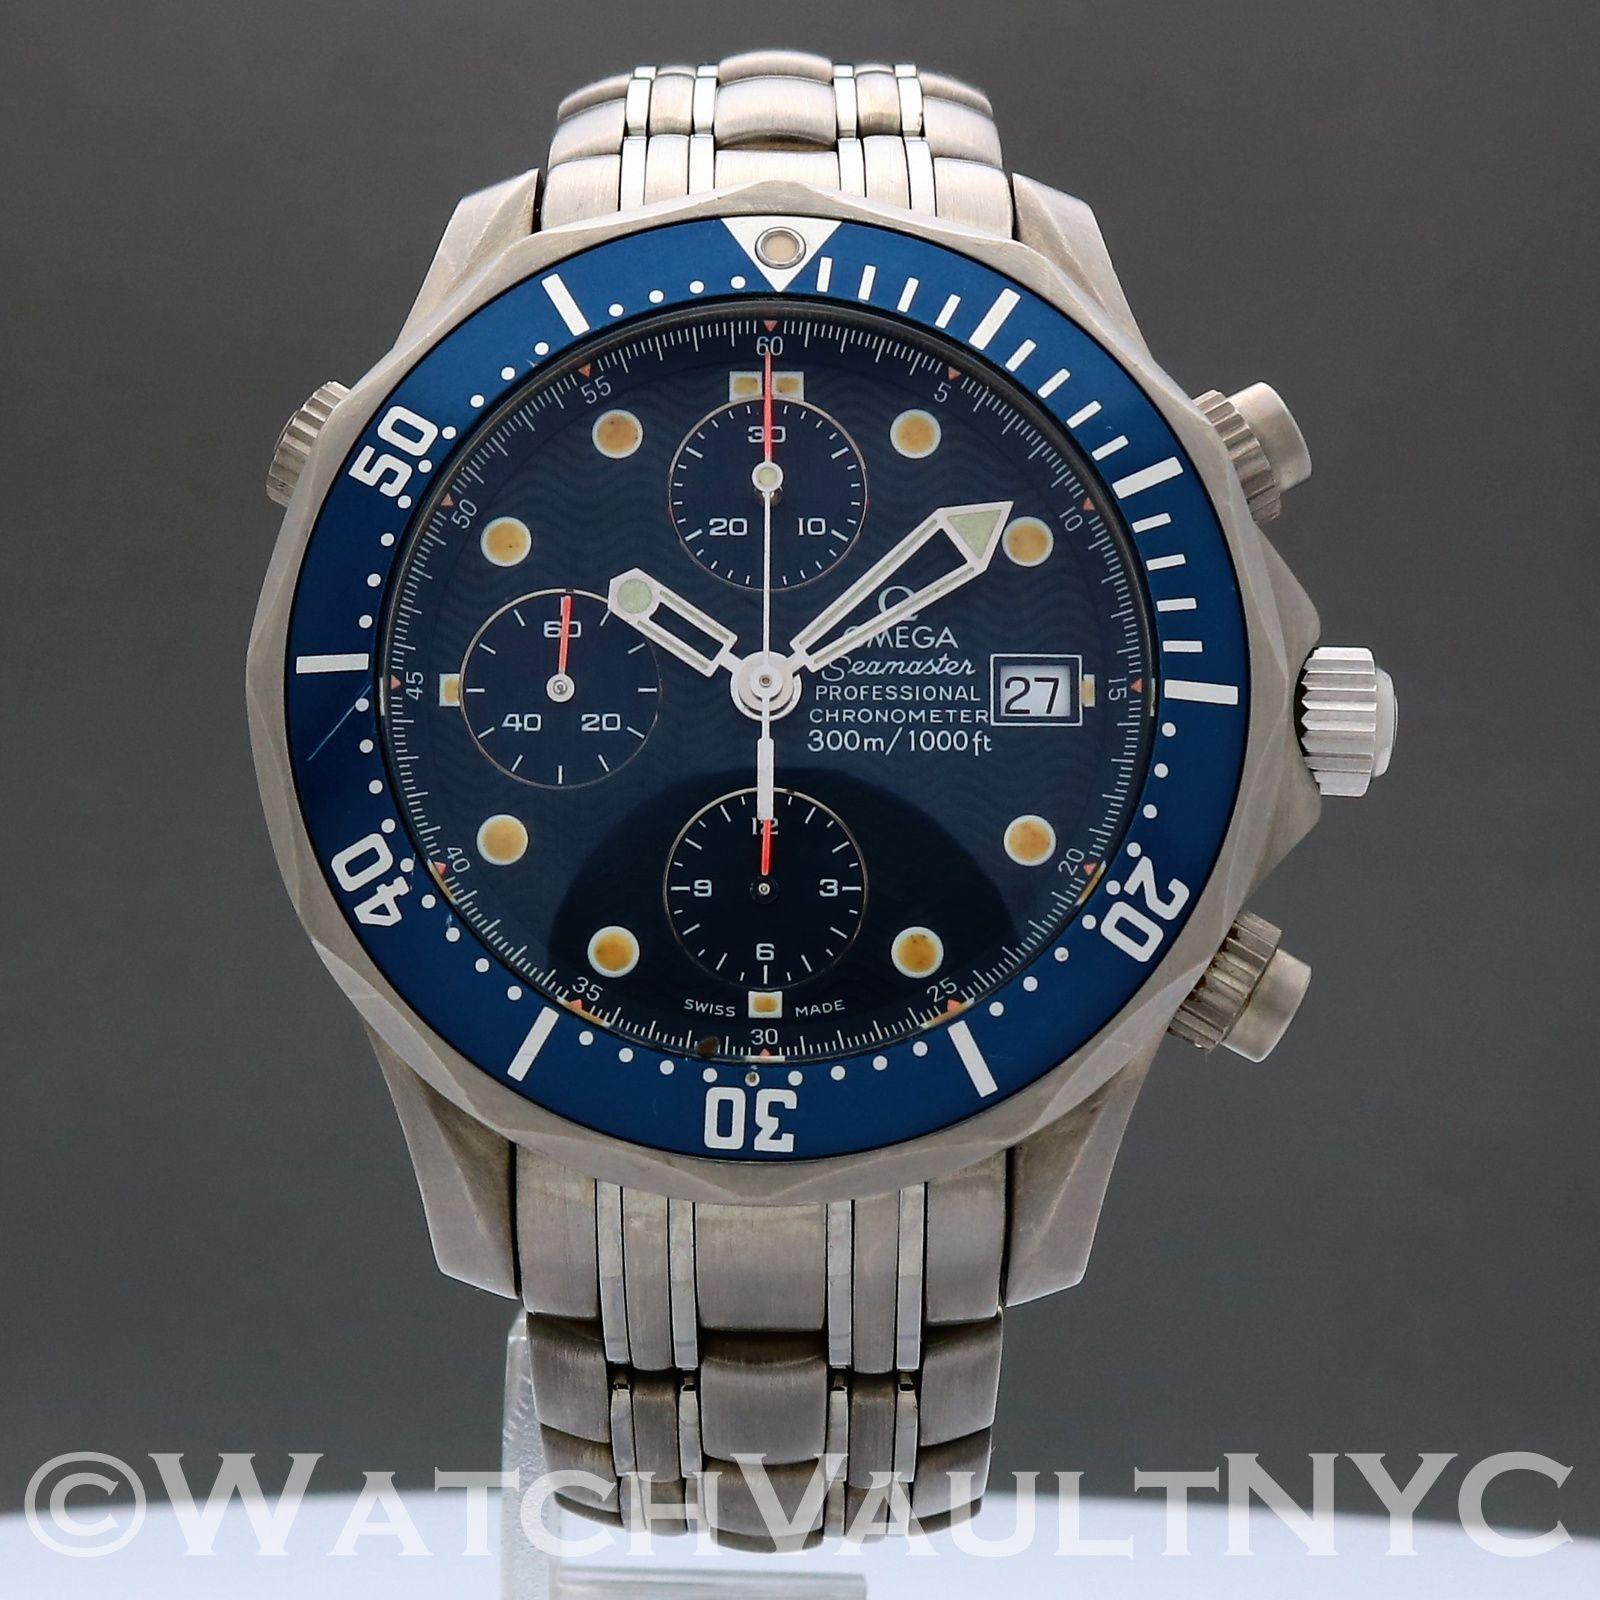 Omega Seamaster Professional 300m Chrono Titanium James Bond Omega Seamaster Professional Omega Seamaster James Bond Watch